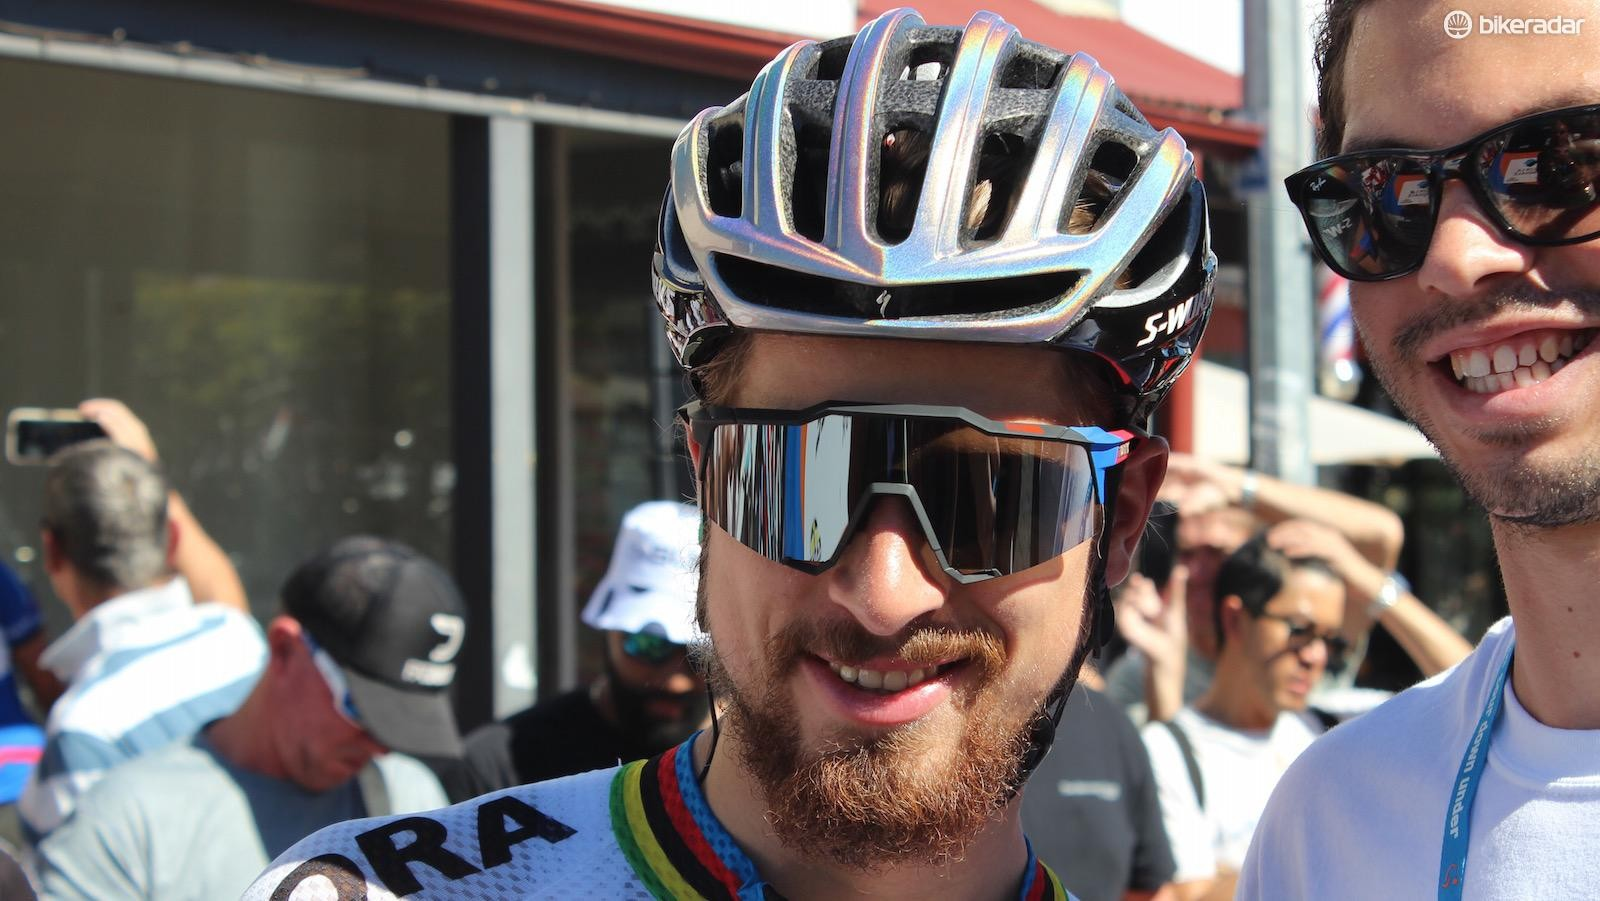 Peter Sagan's custom S-Works Prevail helmet and 100% glasses